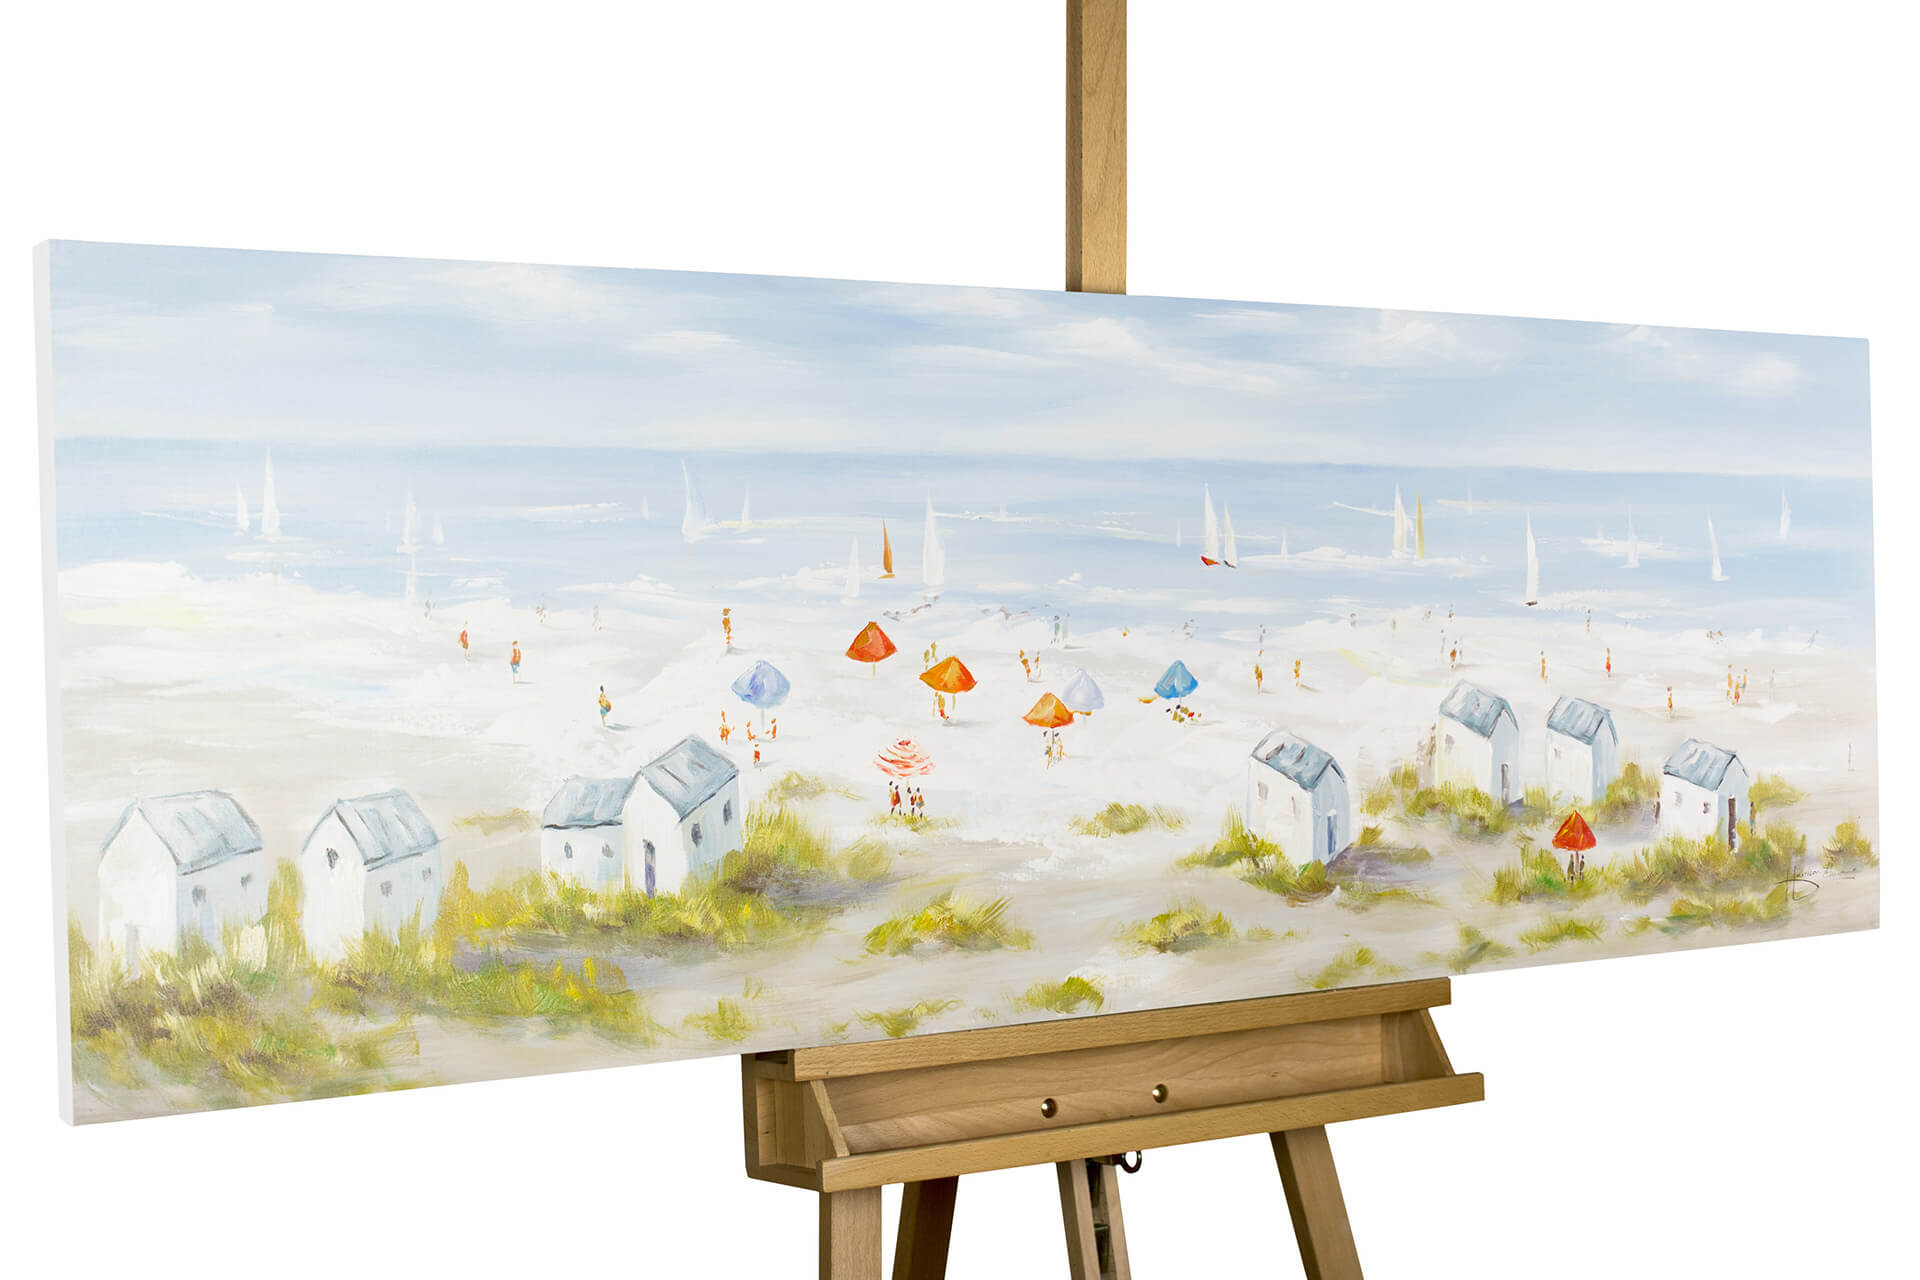 kl strandkorb meer ostsee pastell blau acryl gemaelde acryl bilder leinwandbilder moderne kunst 01